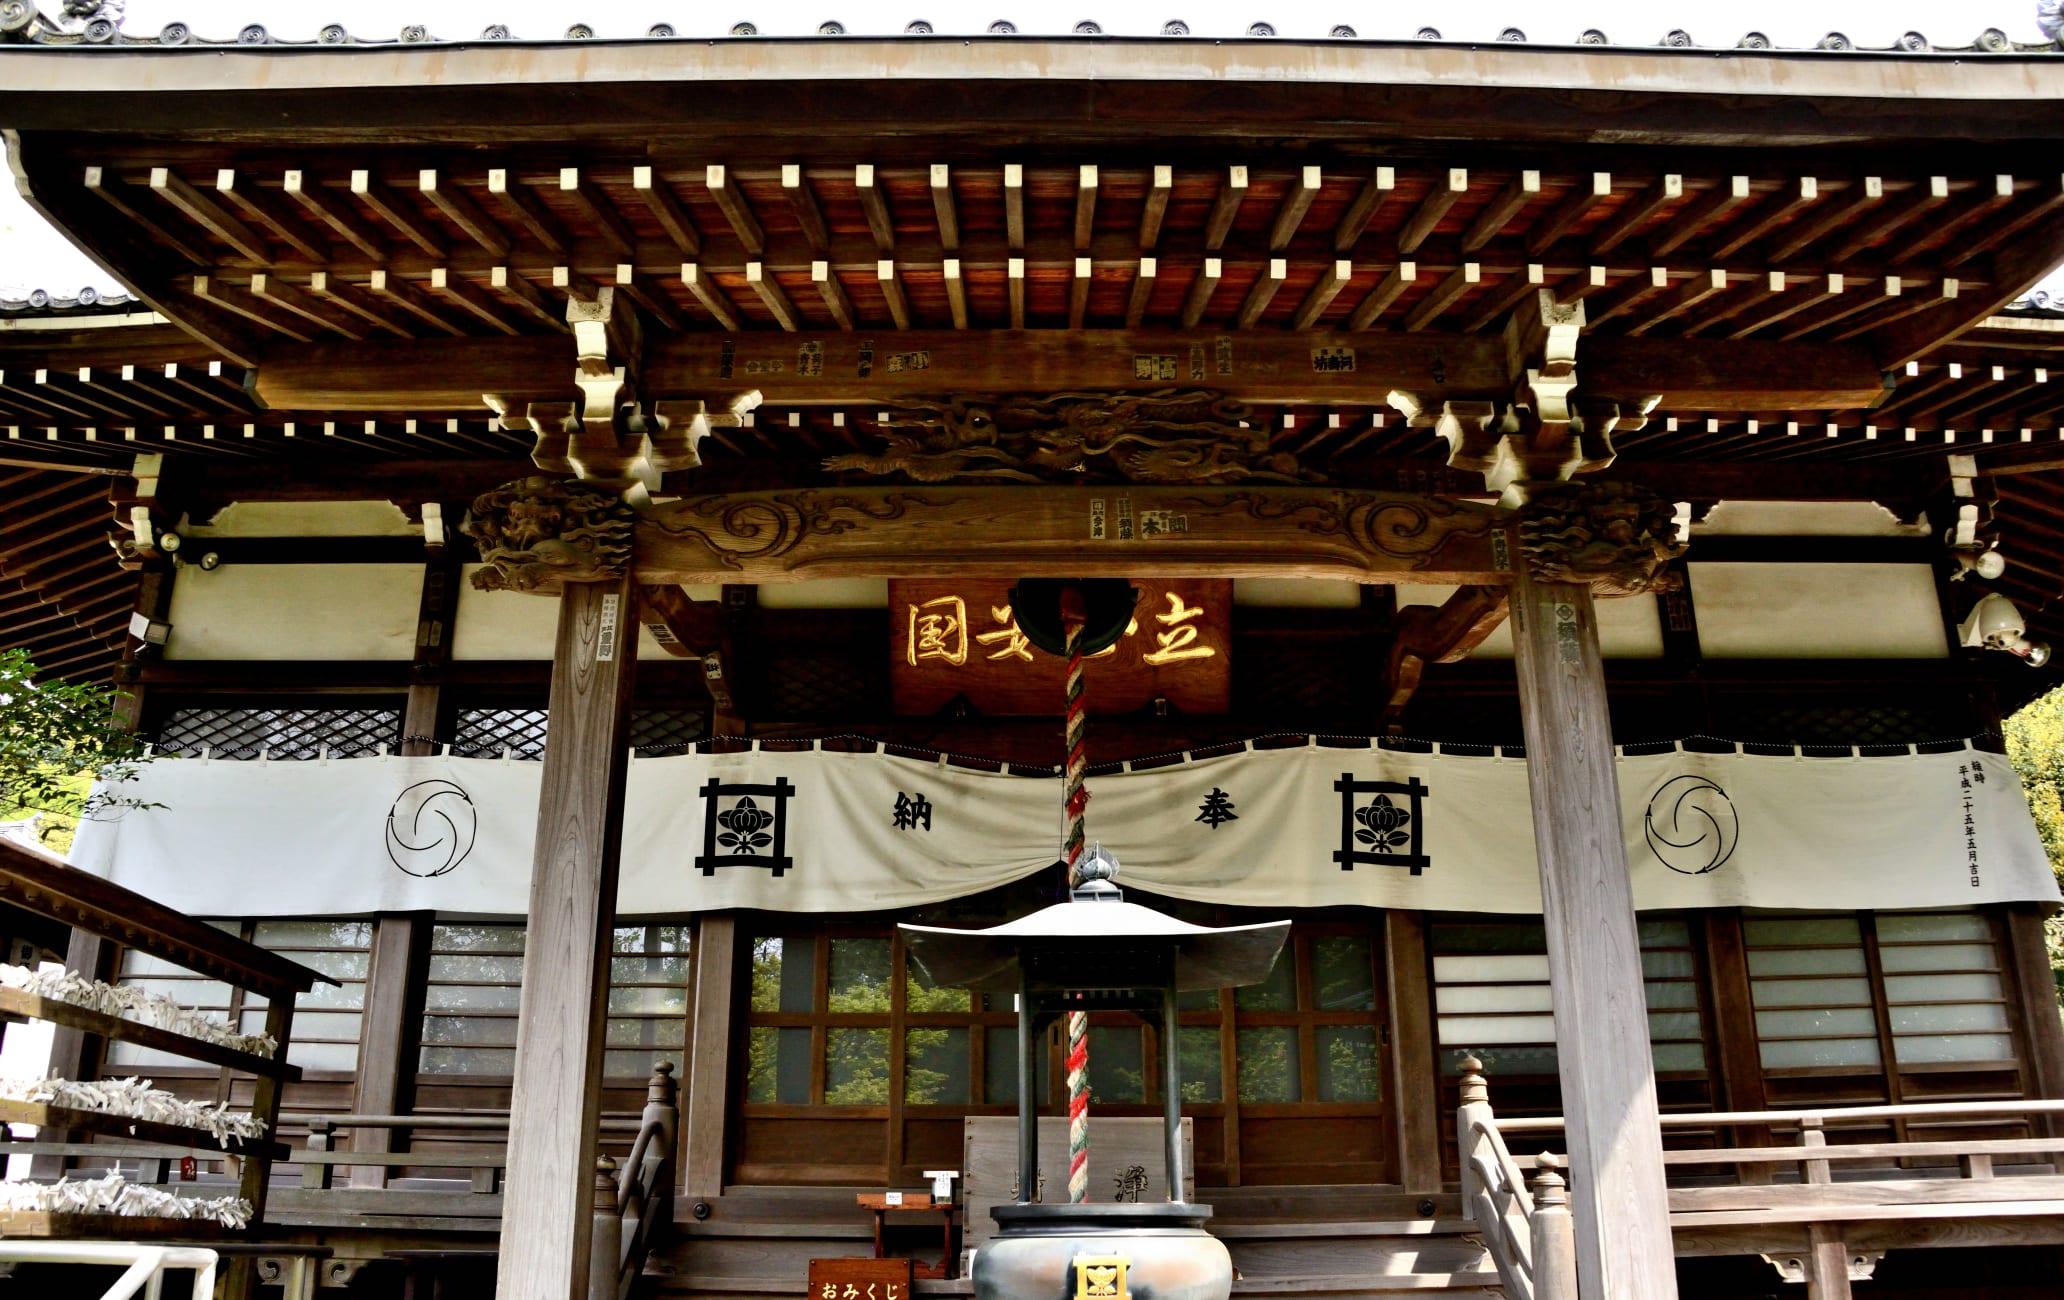 Ankokuron-ji Temple